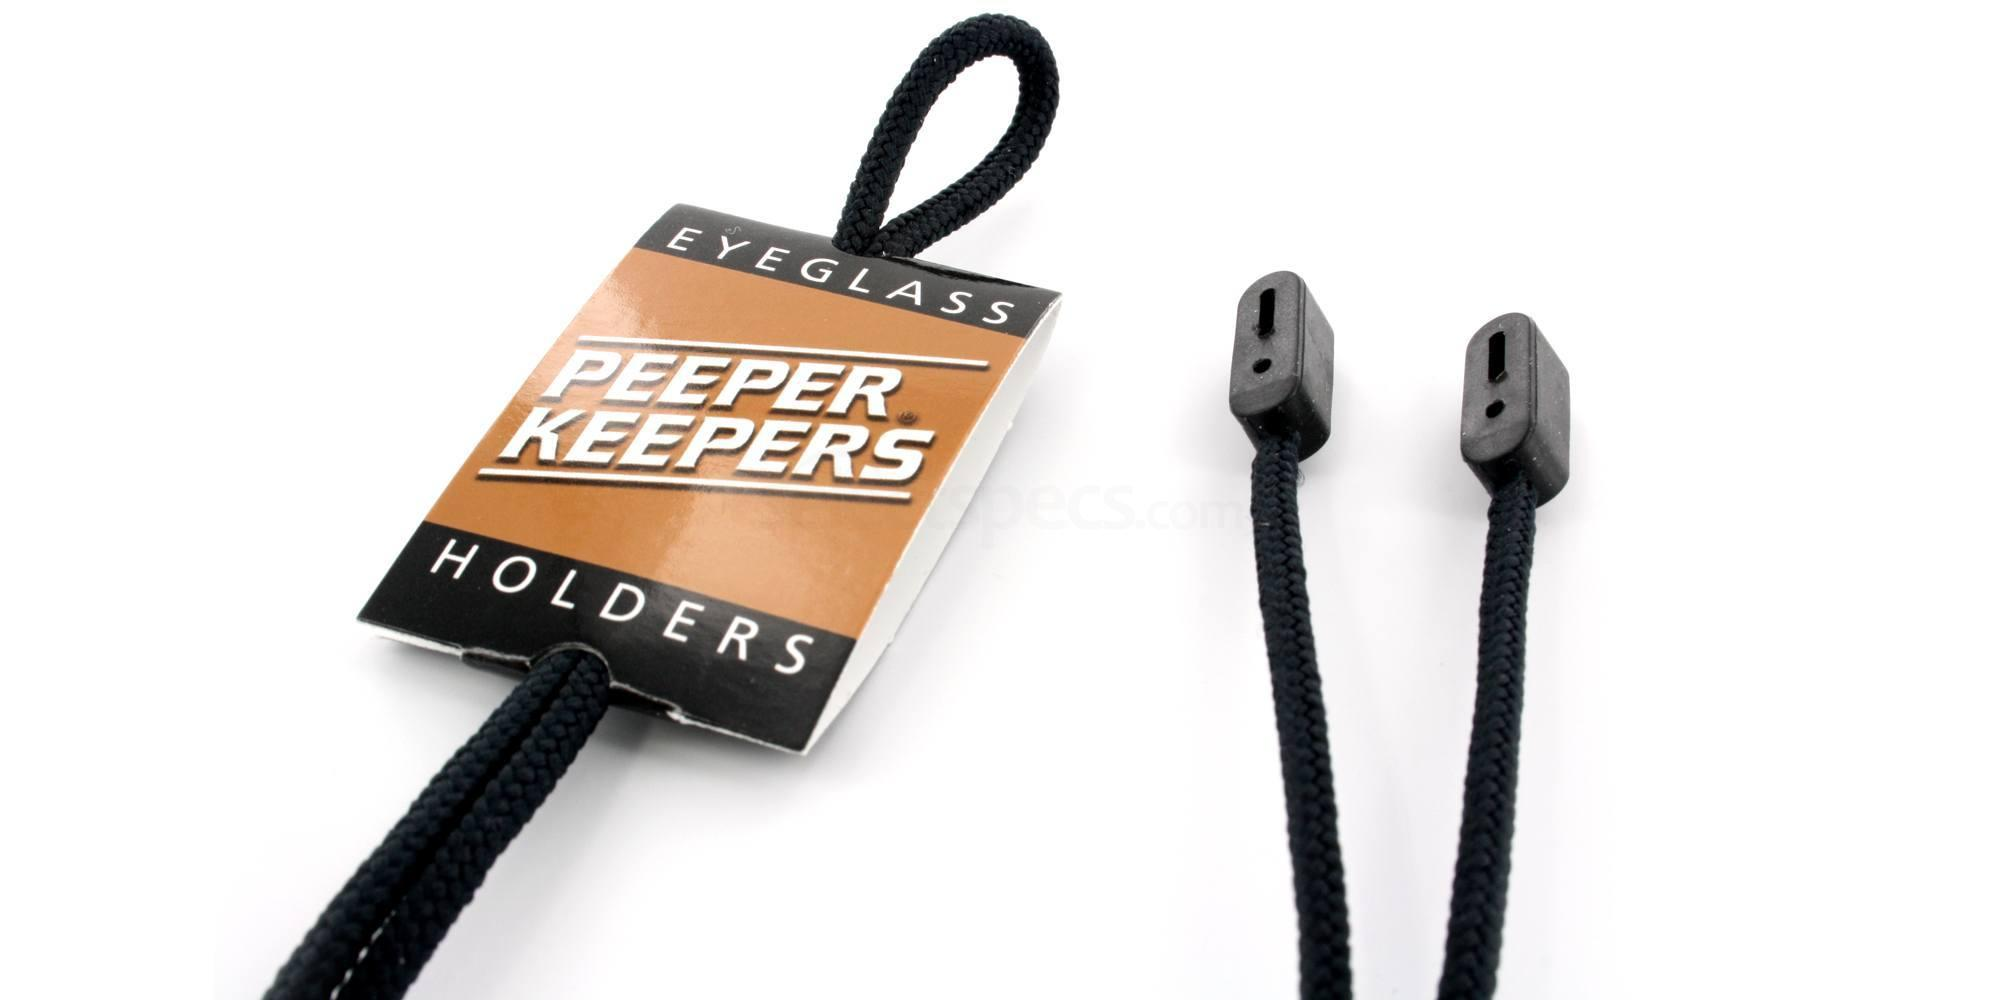 SCBK Supercord Black Lanyard Accessories, Optical accessories